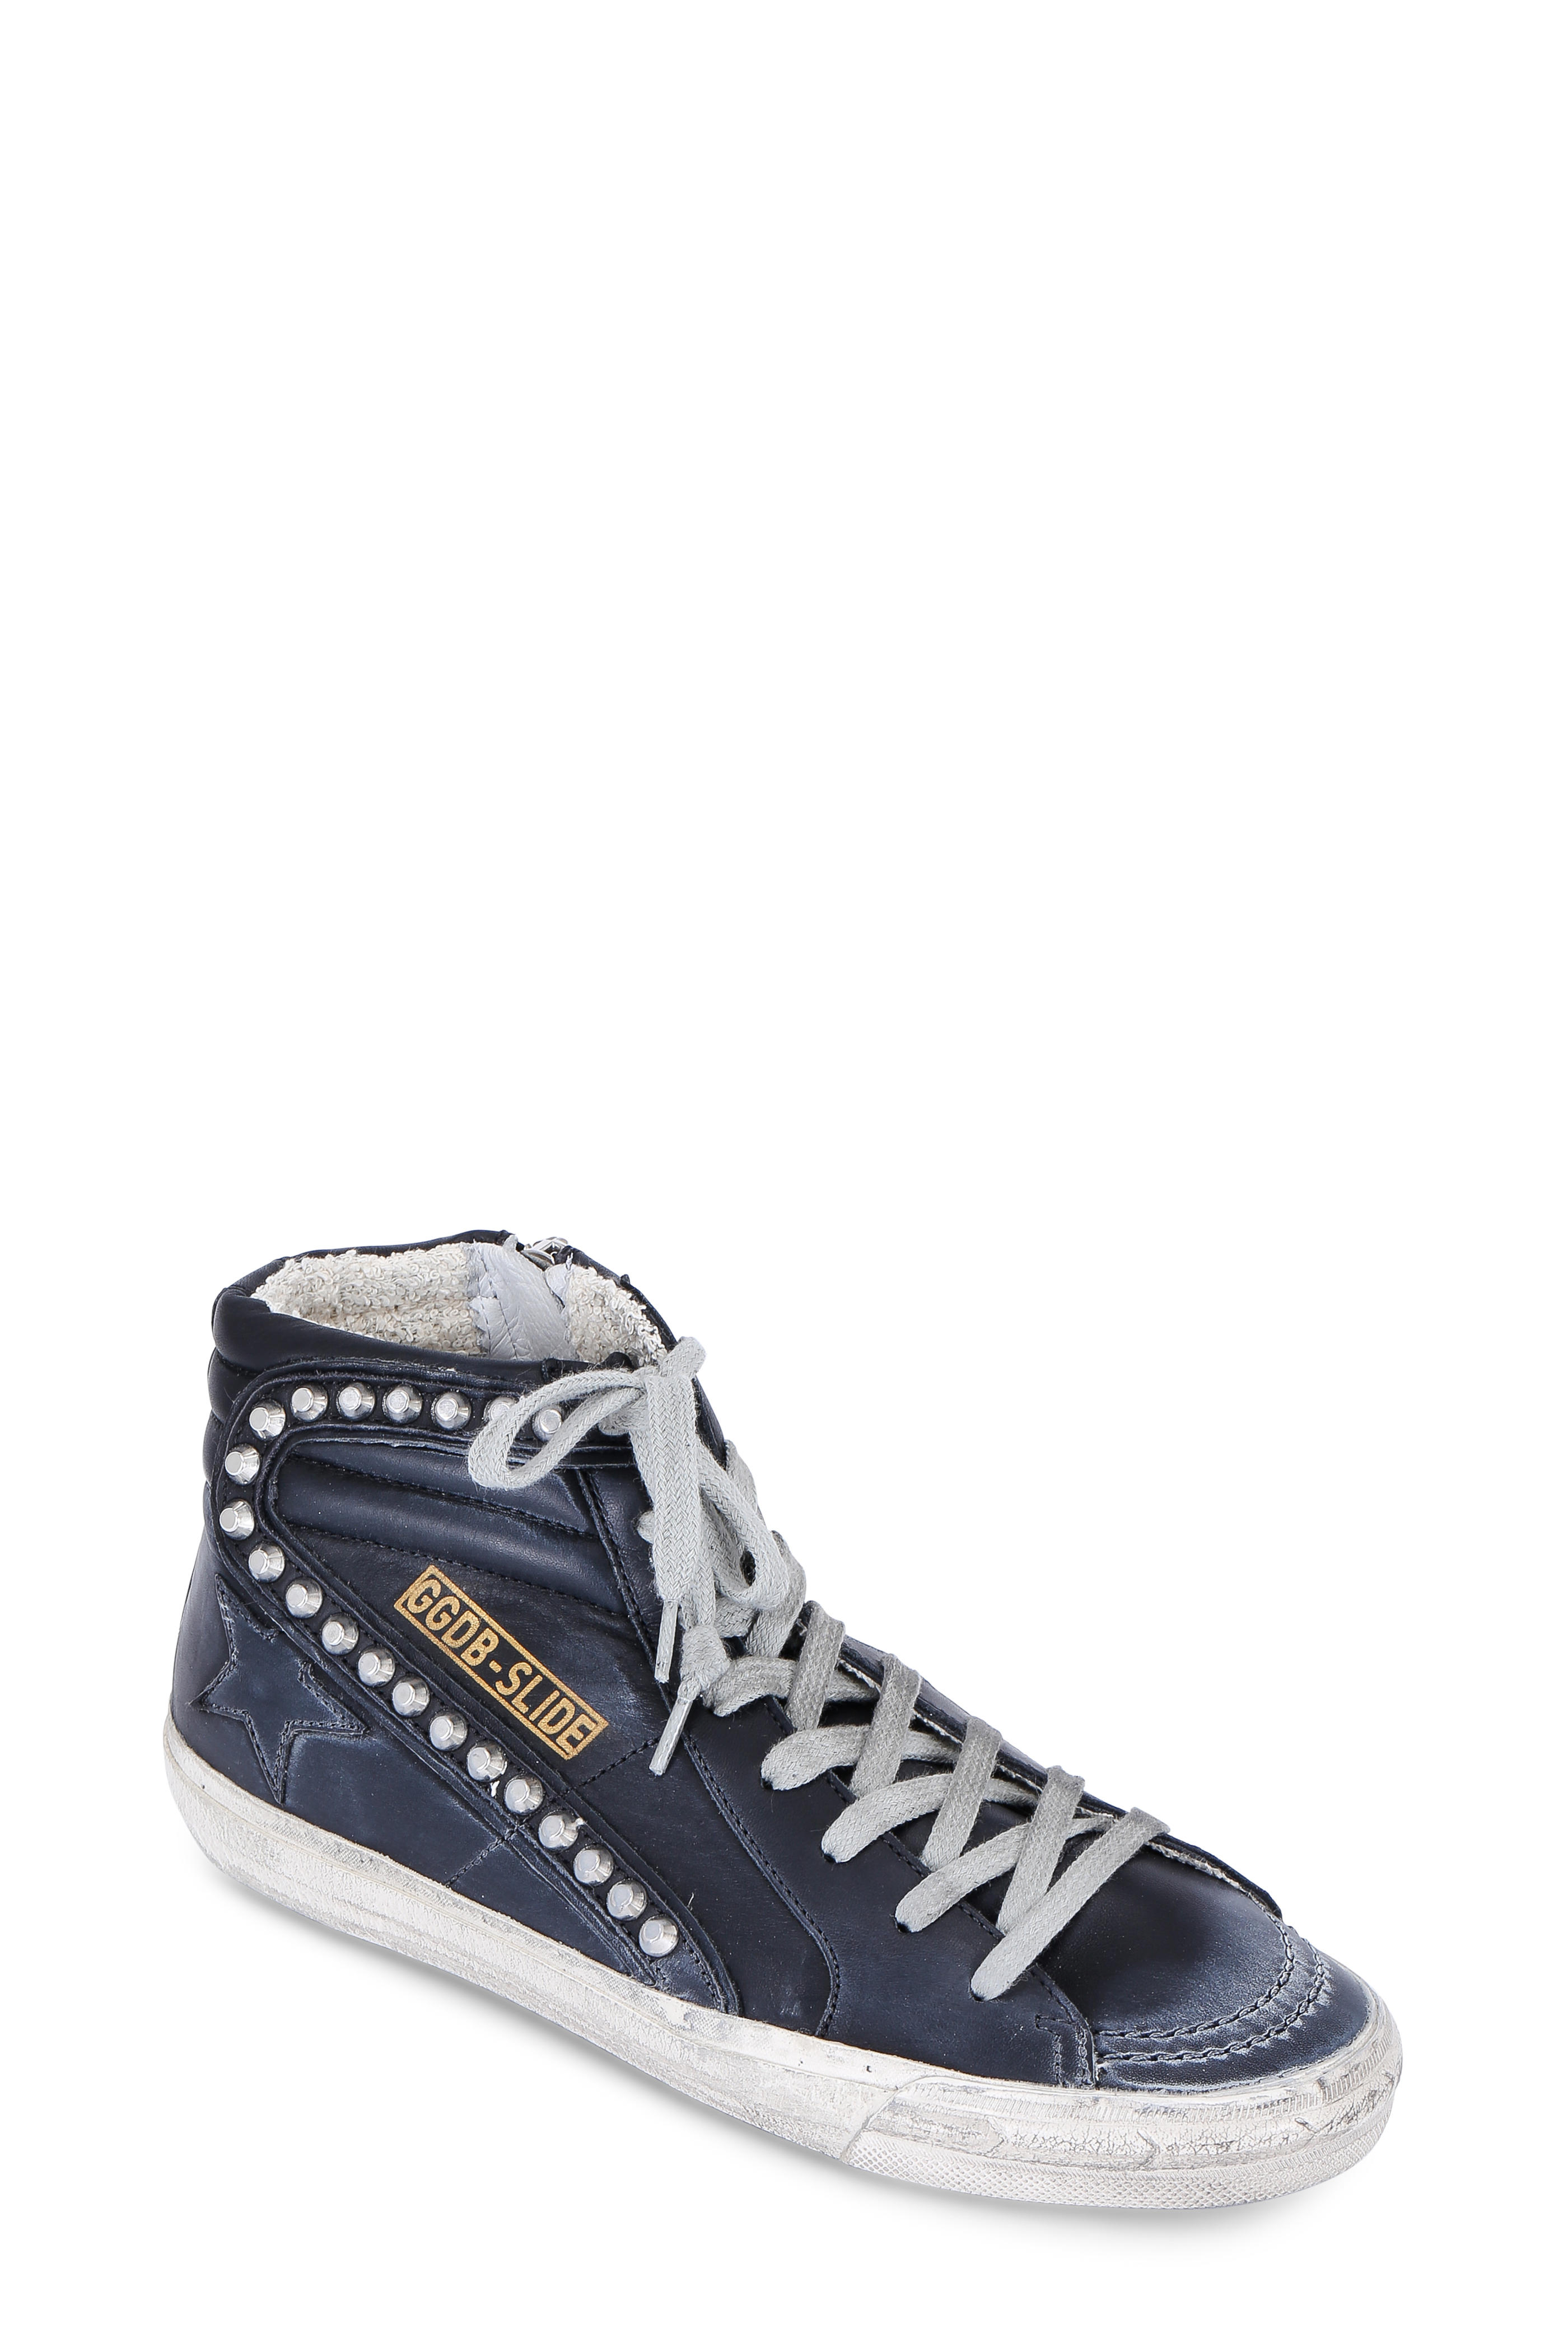 65b6efc2bc00 Golden Goose - Women s Slide Black Leather Stud High Top Sneaker ...